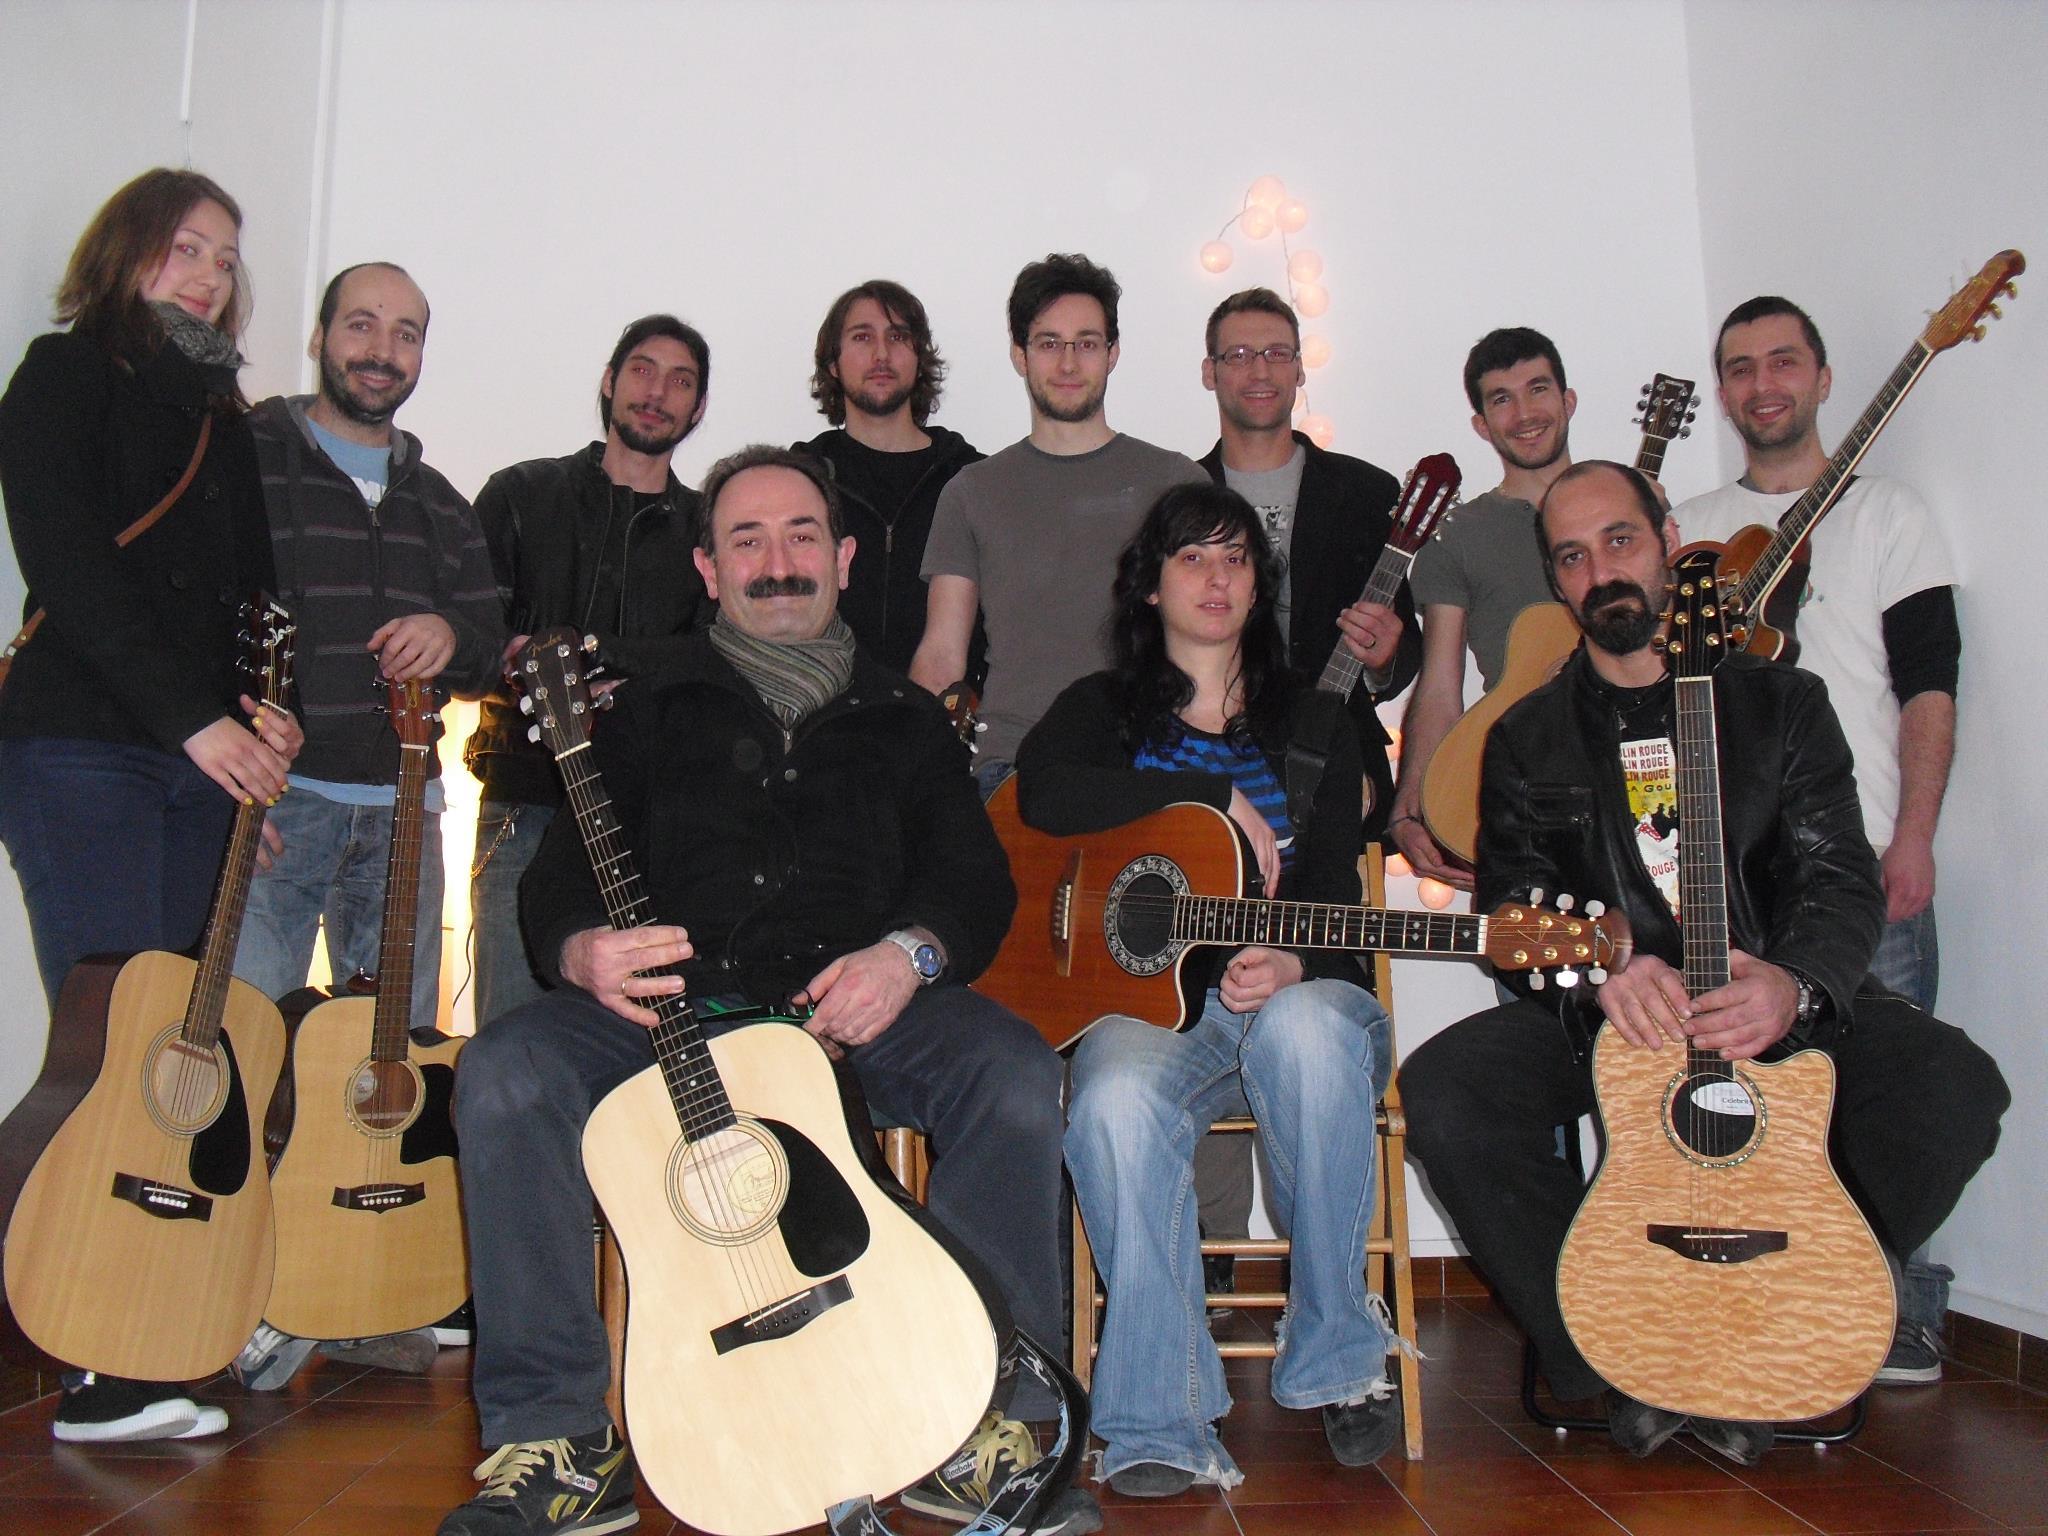 Taller de Guitarra 2012 - Foto grupo - Clases de Guitarra Barcelona